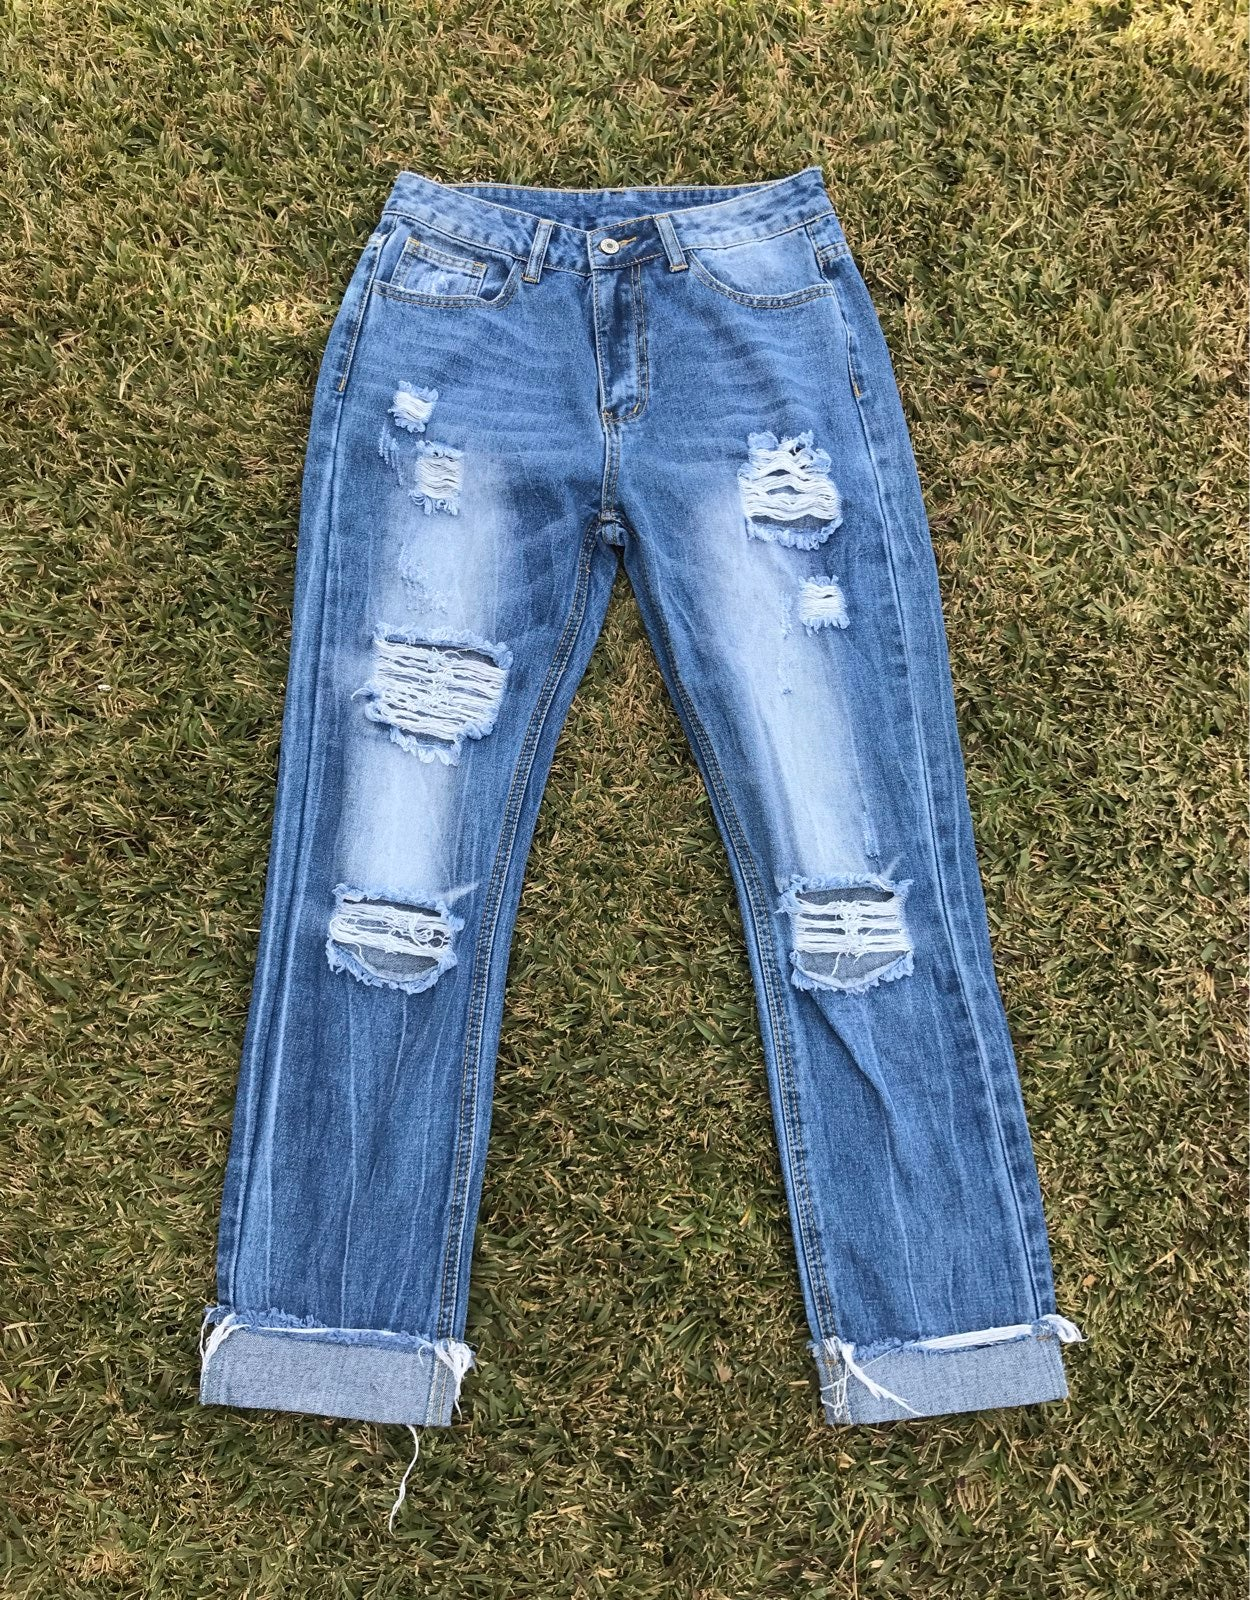 Medium Washed SHEIN jeans